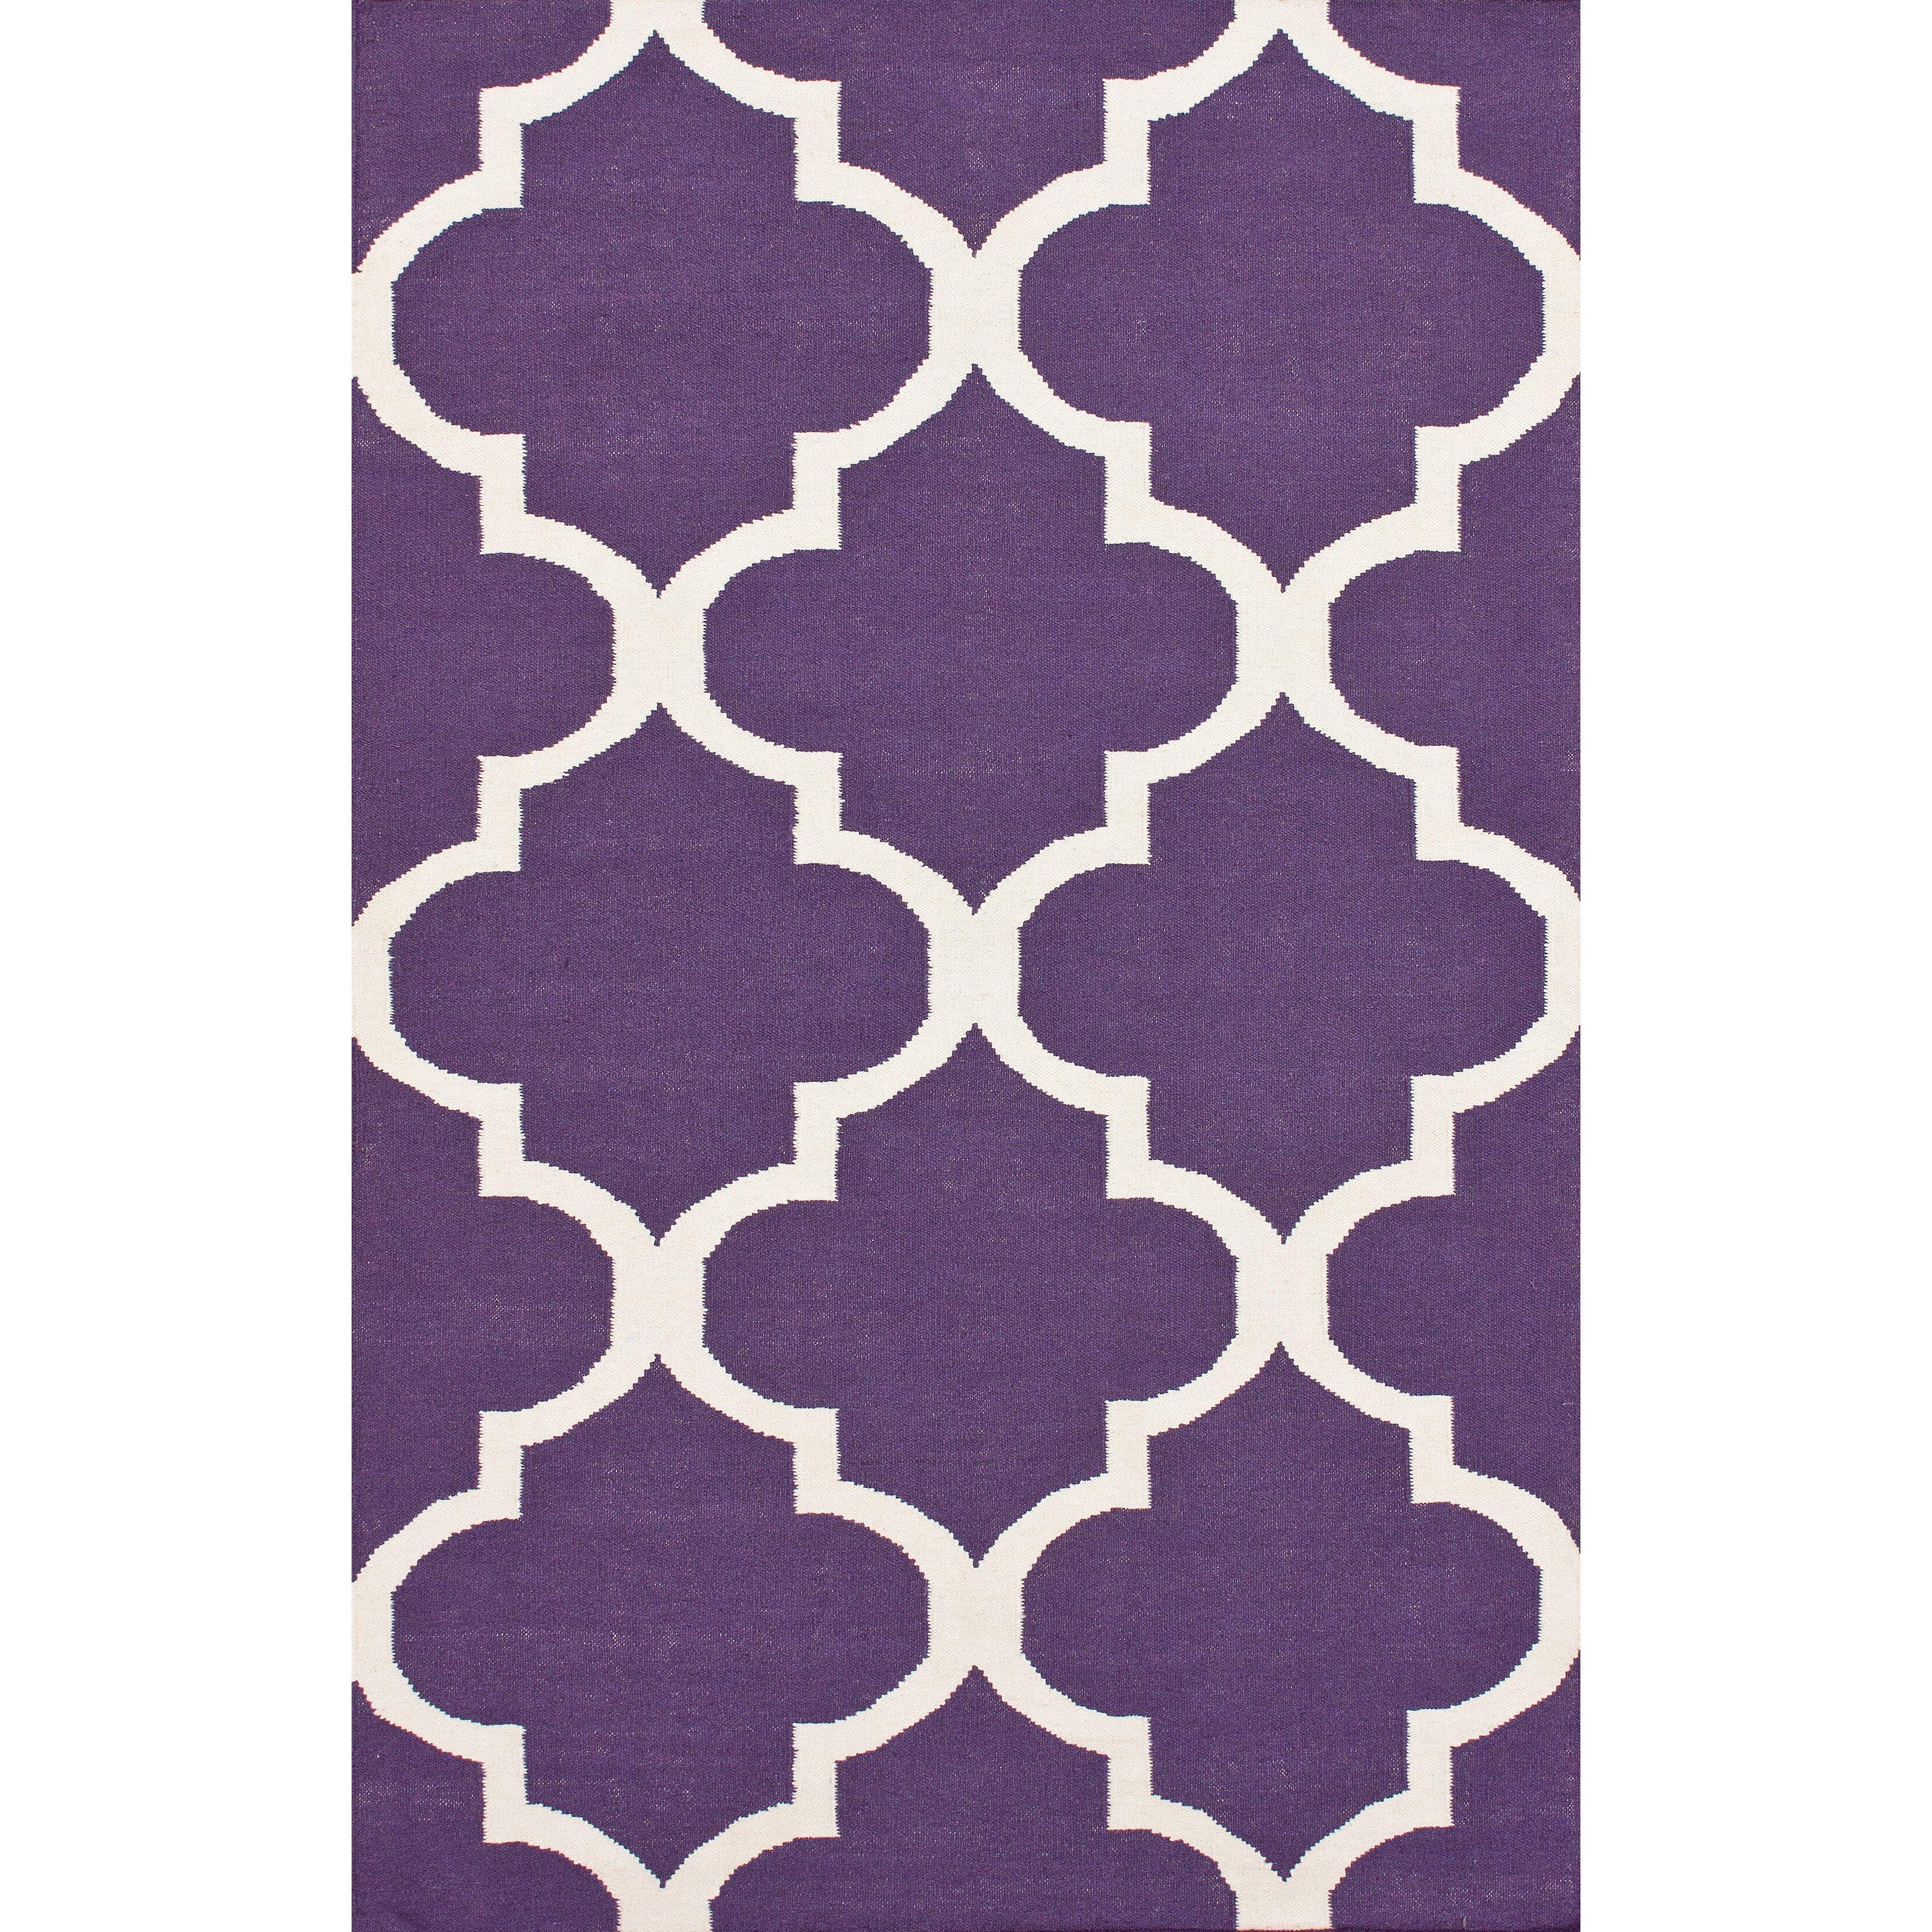 Marbella Moroccan Trellis Purple Kilim Rug